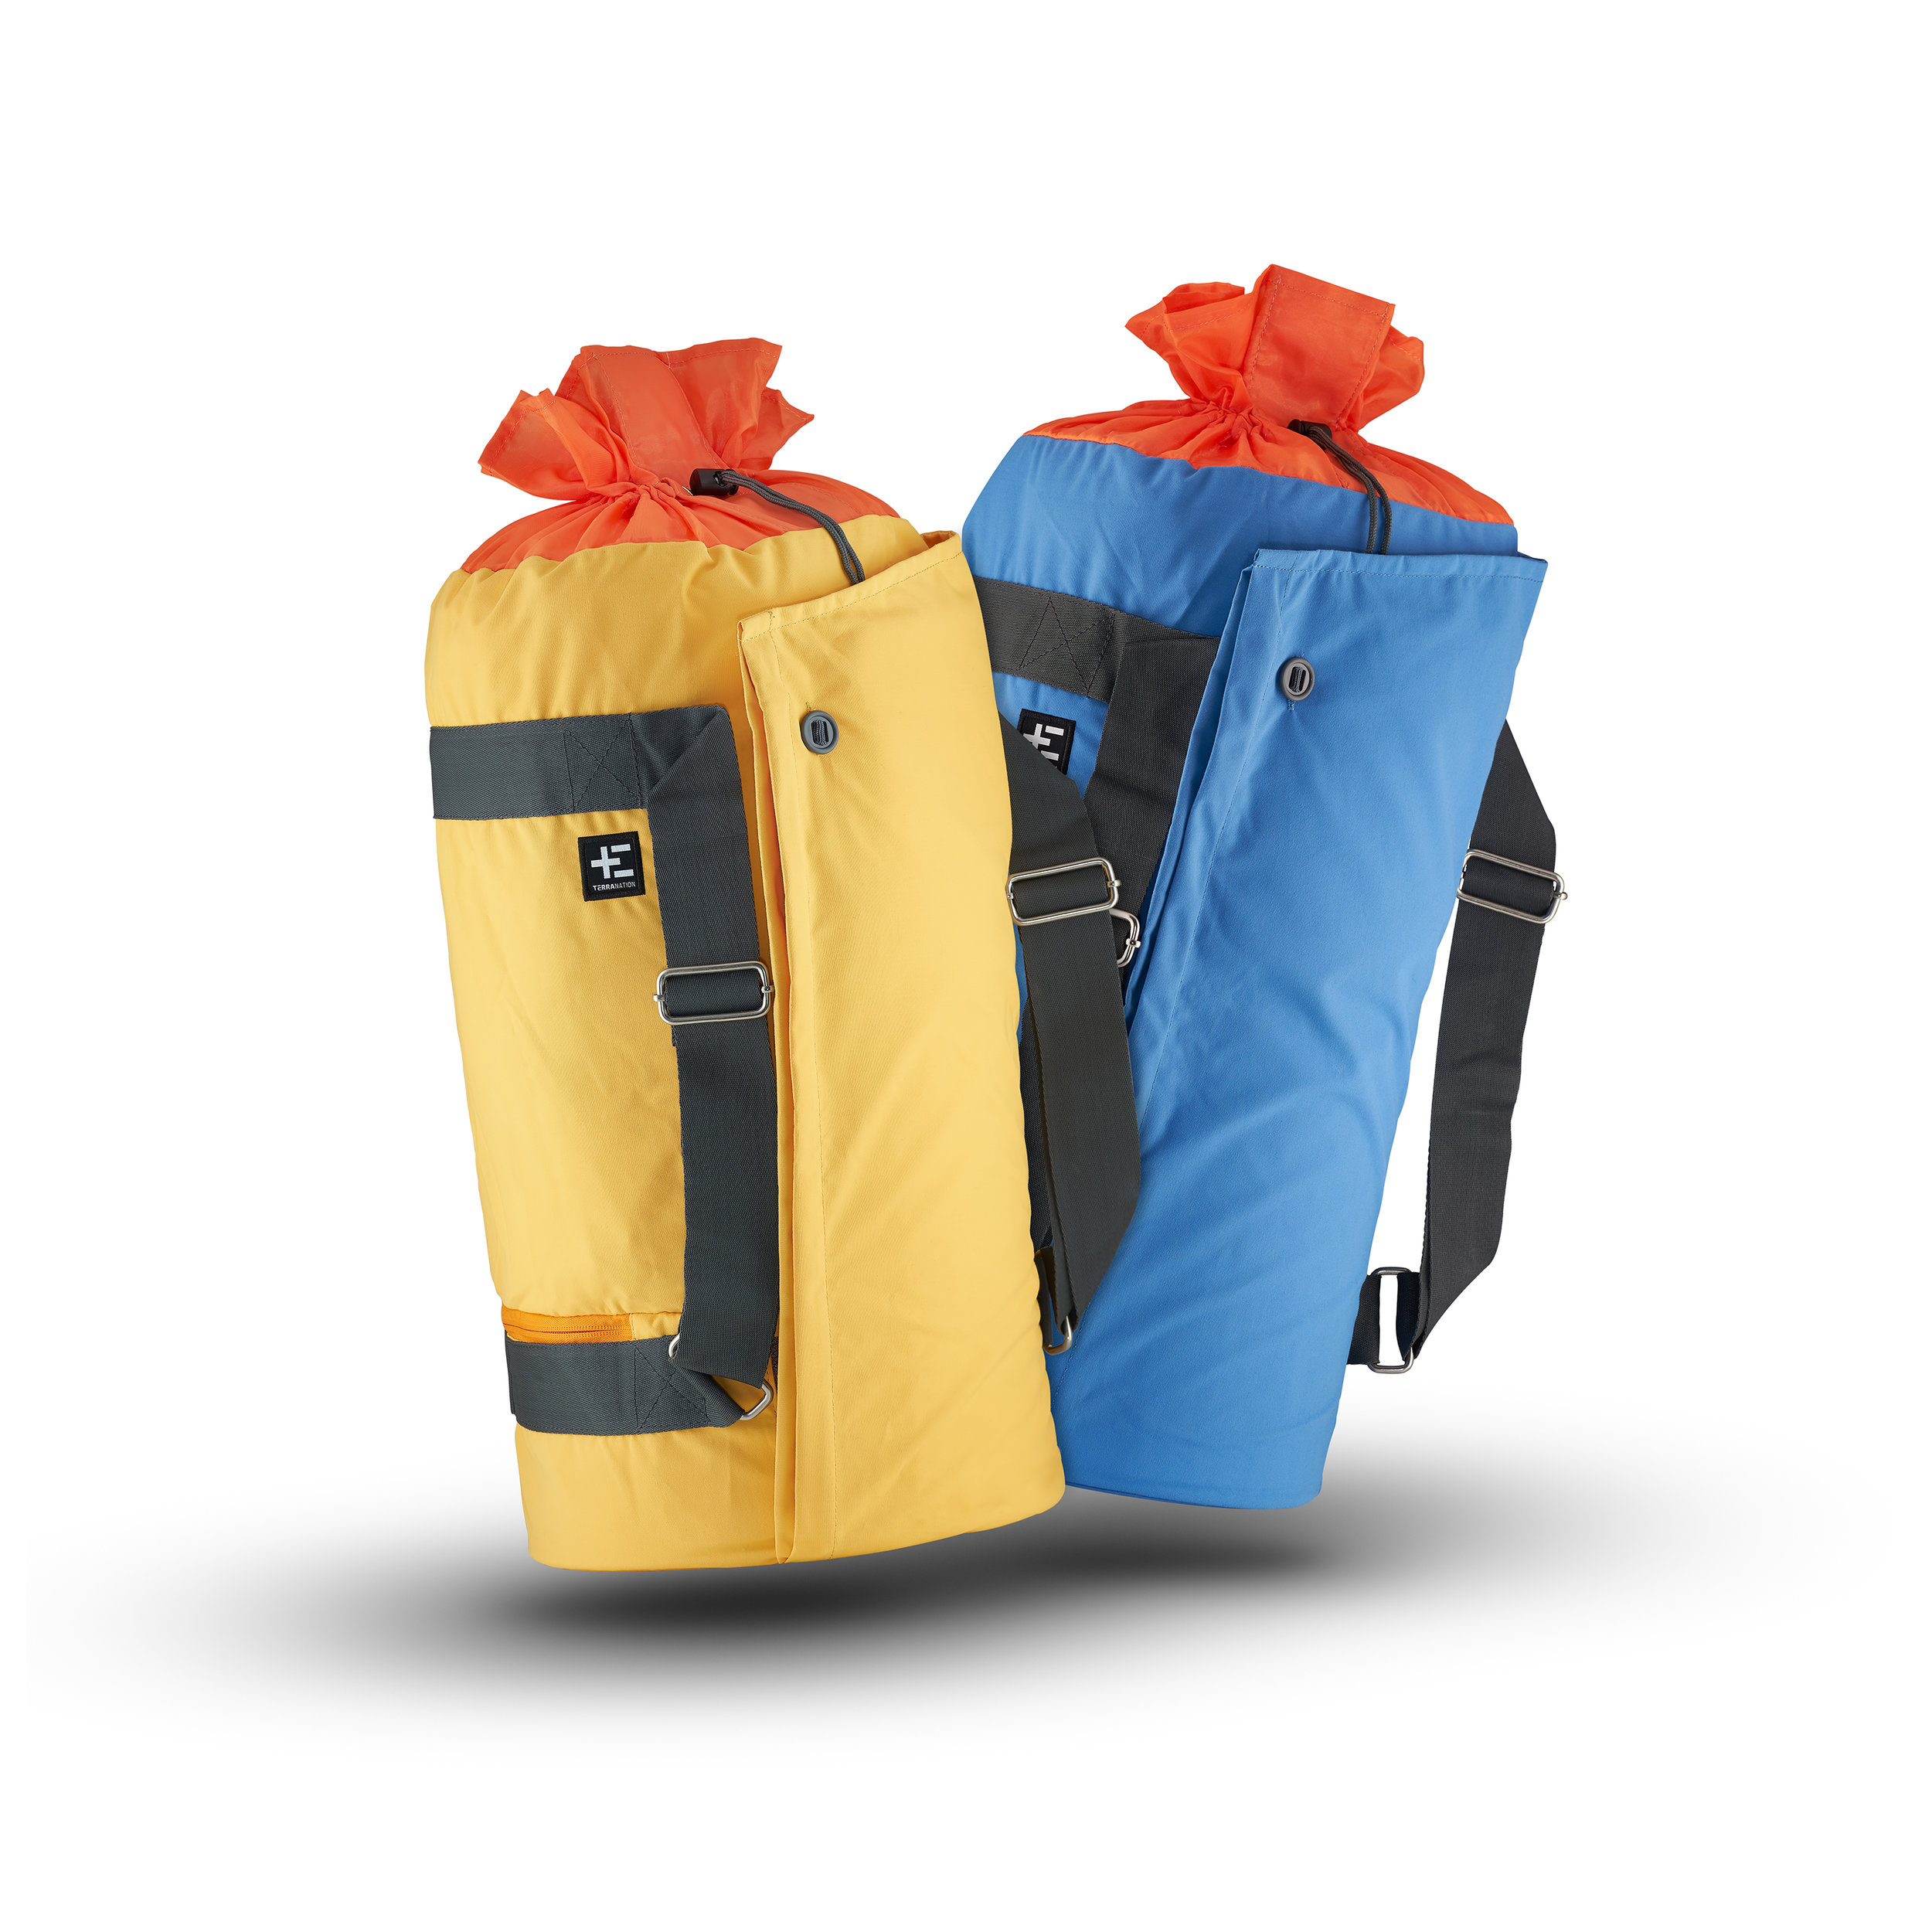 SohoSquare Holborn Bag Group.jpg